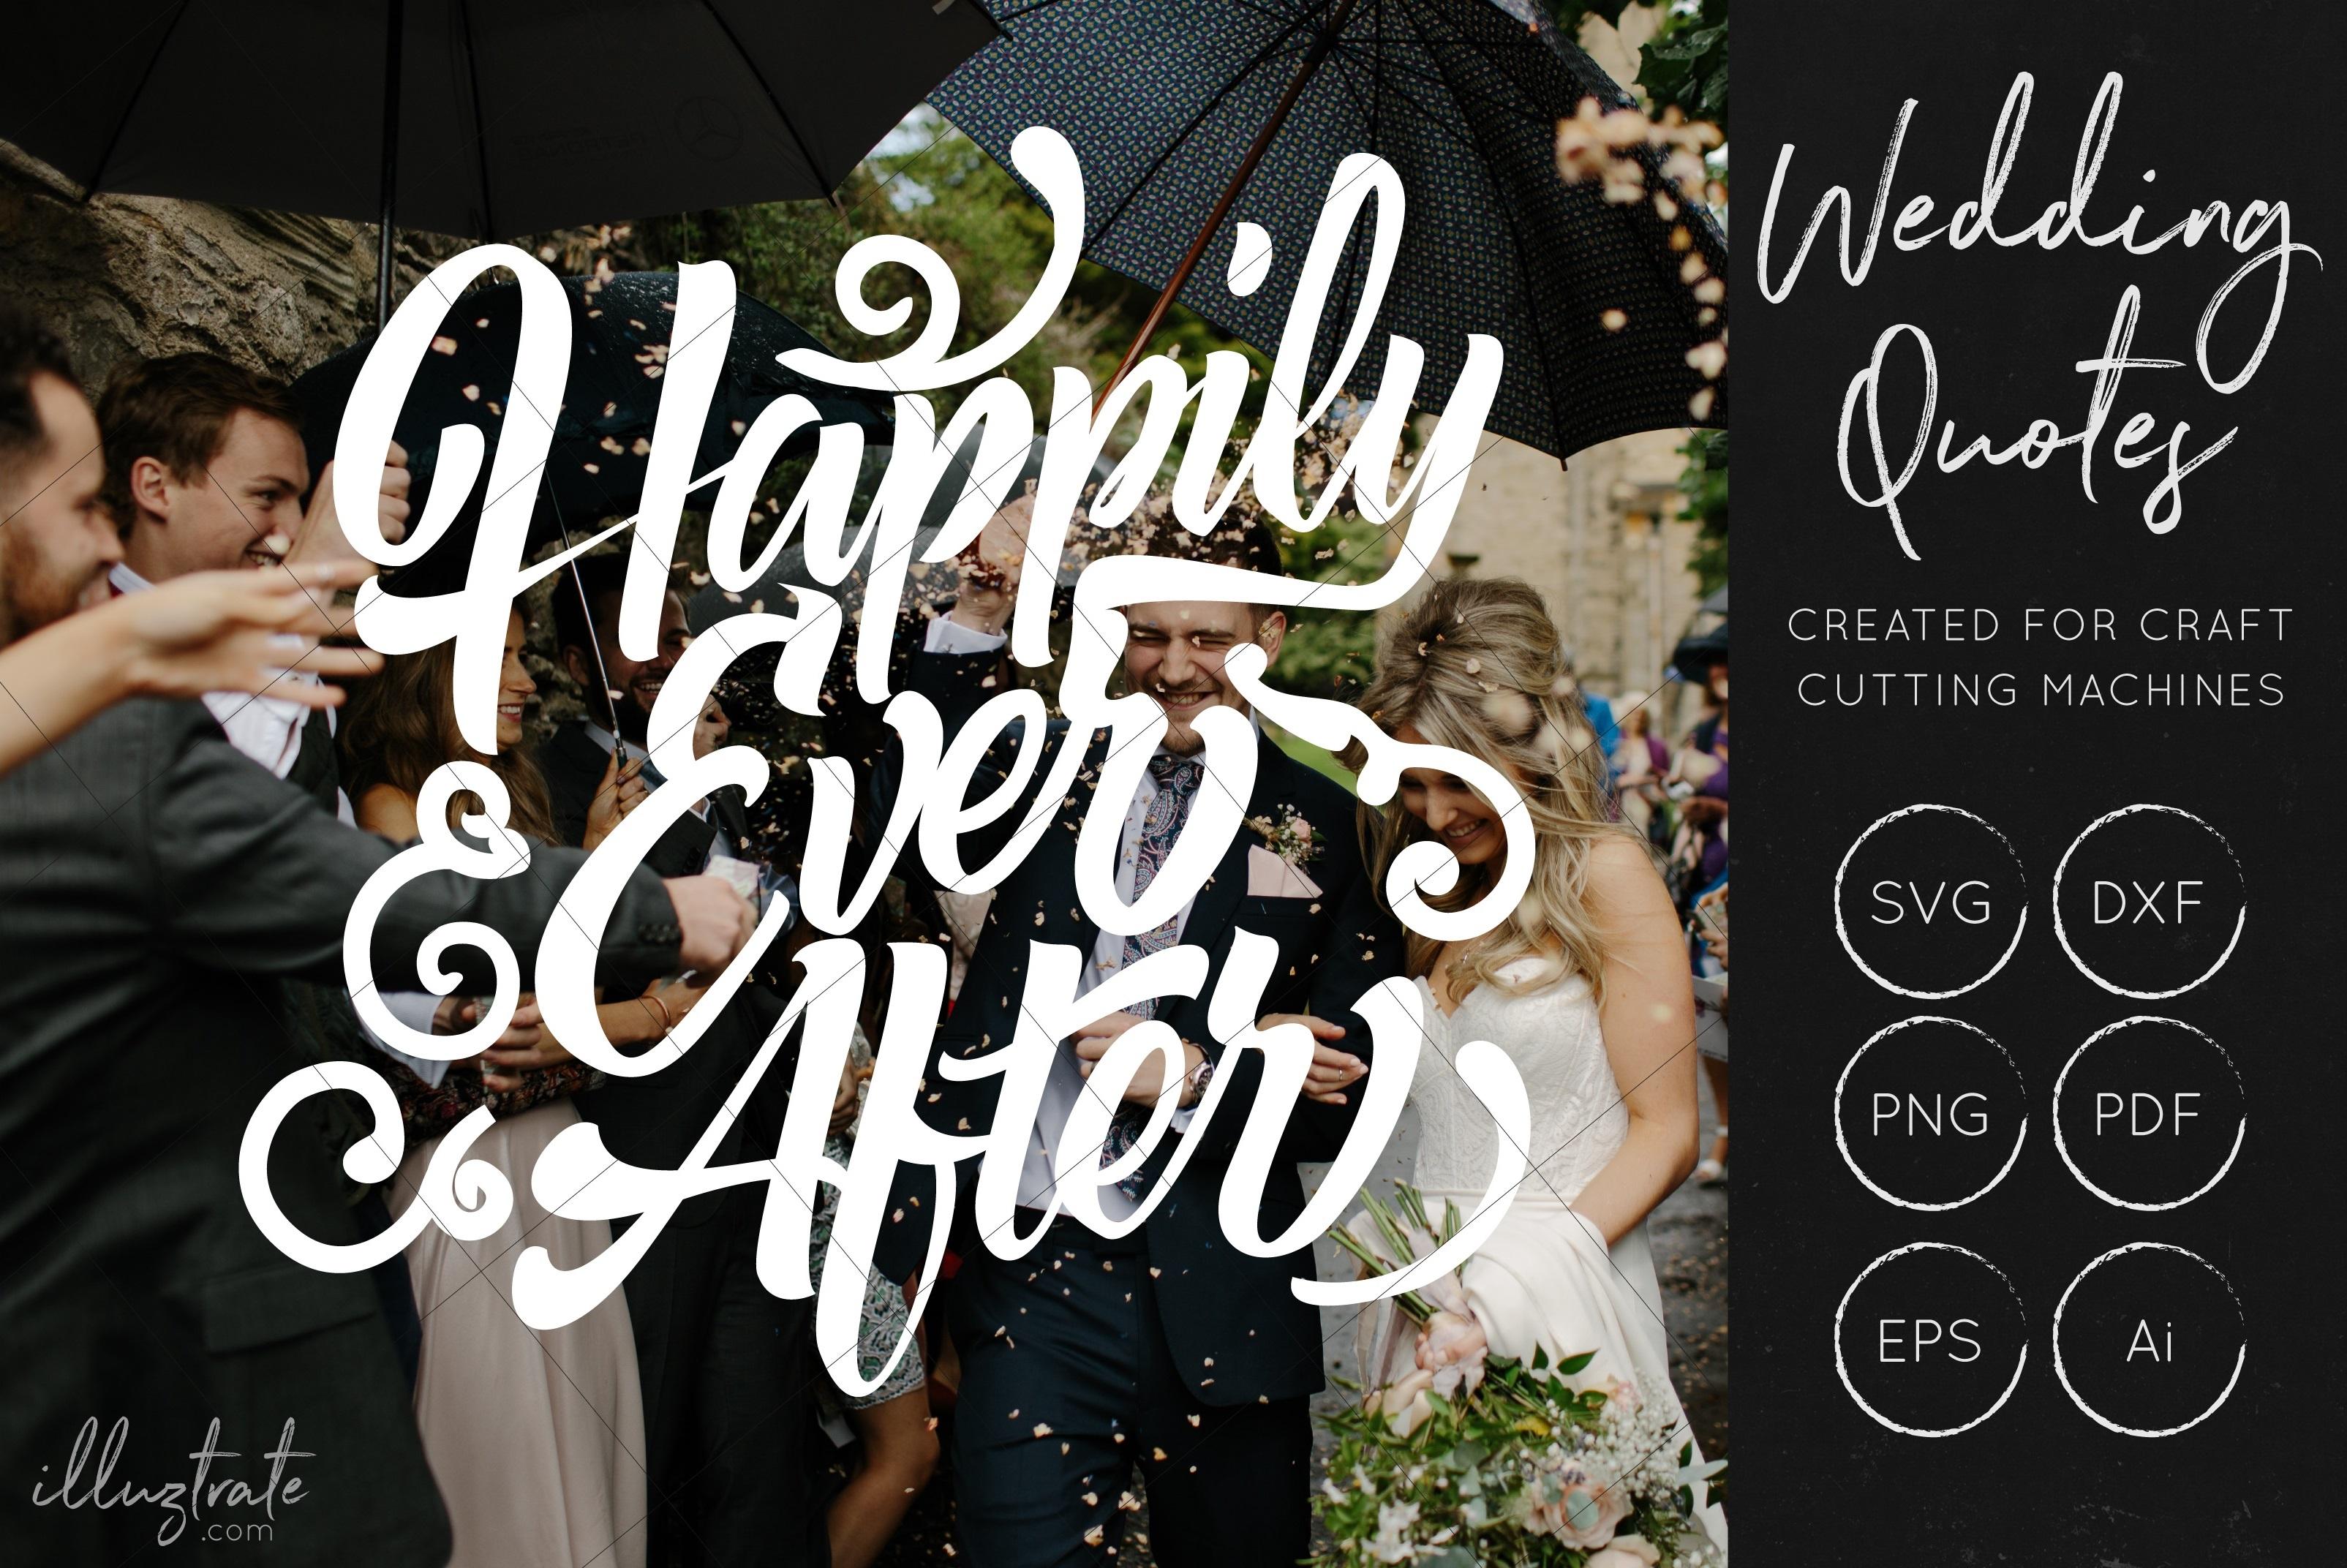 Wedding SVG Cut Files Bundle - Wedding Quotes - Wedding SVG example image 4